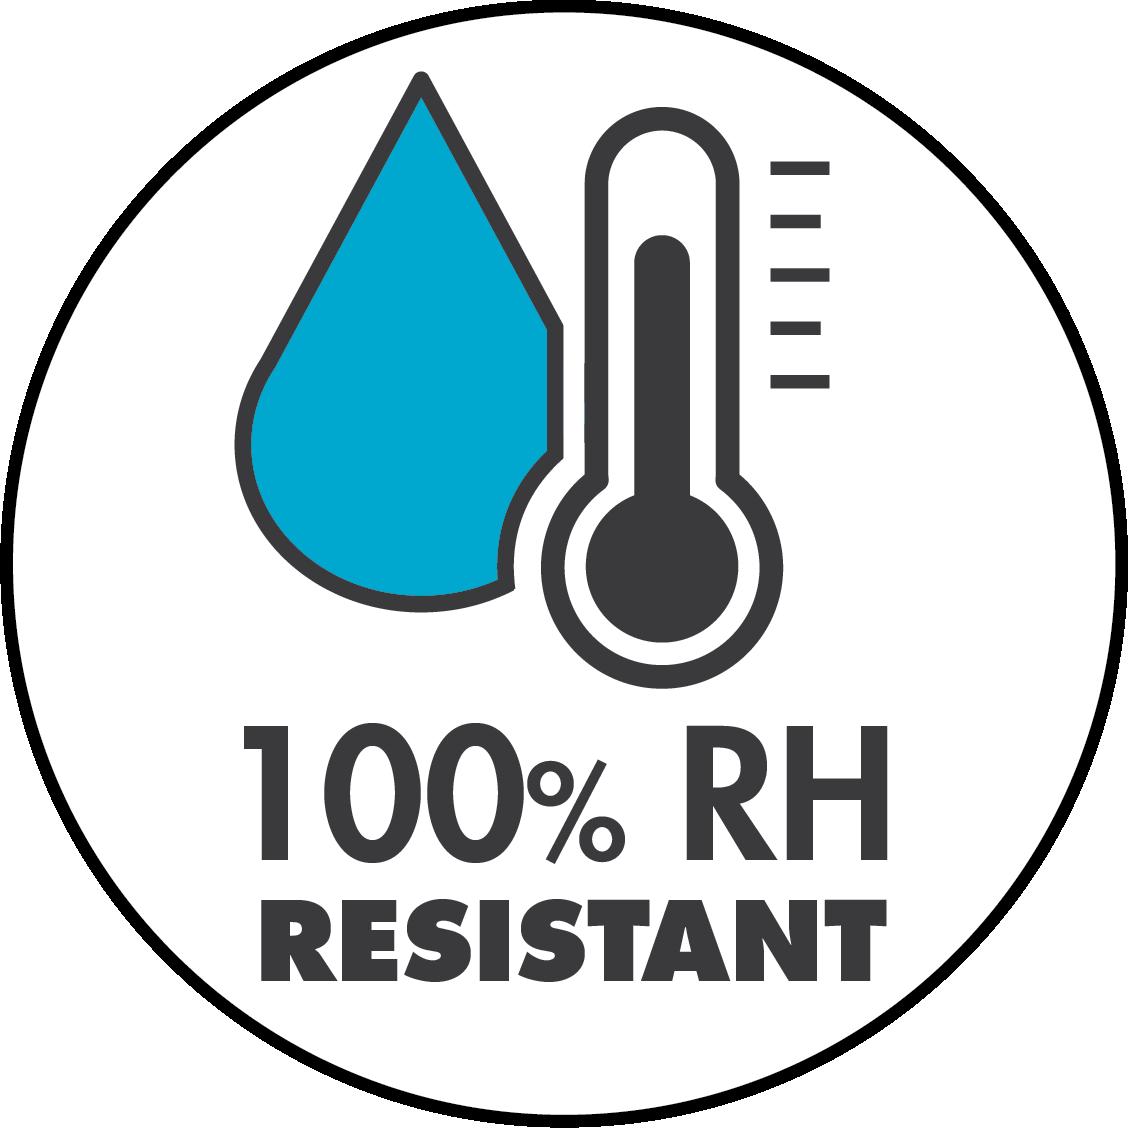 100% RH Resistant